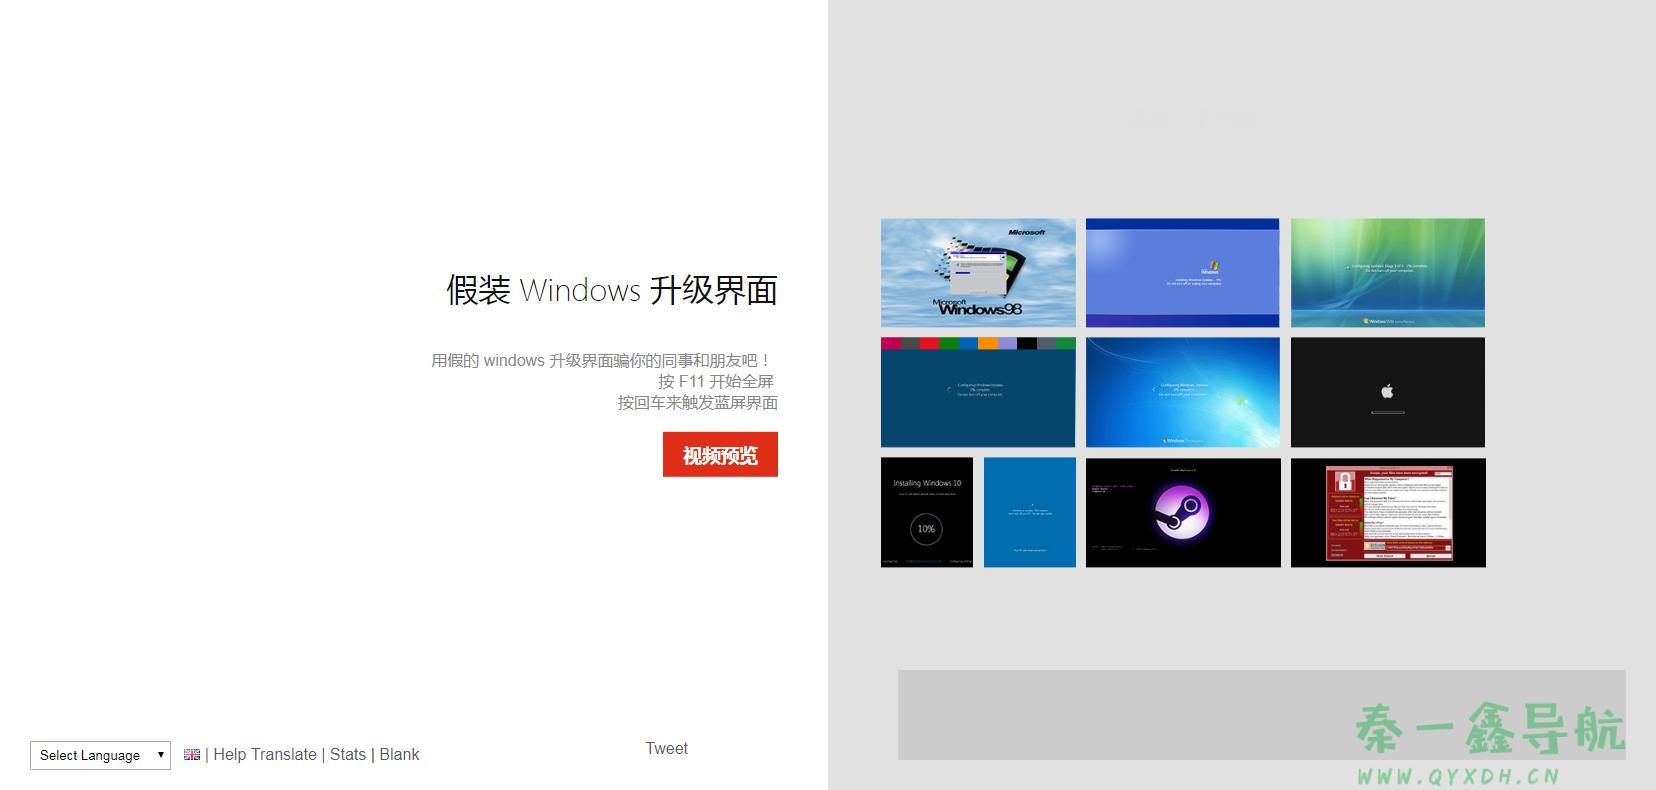 Windows Update Prank